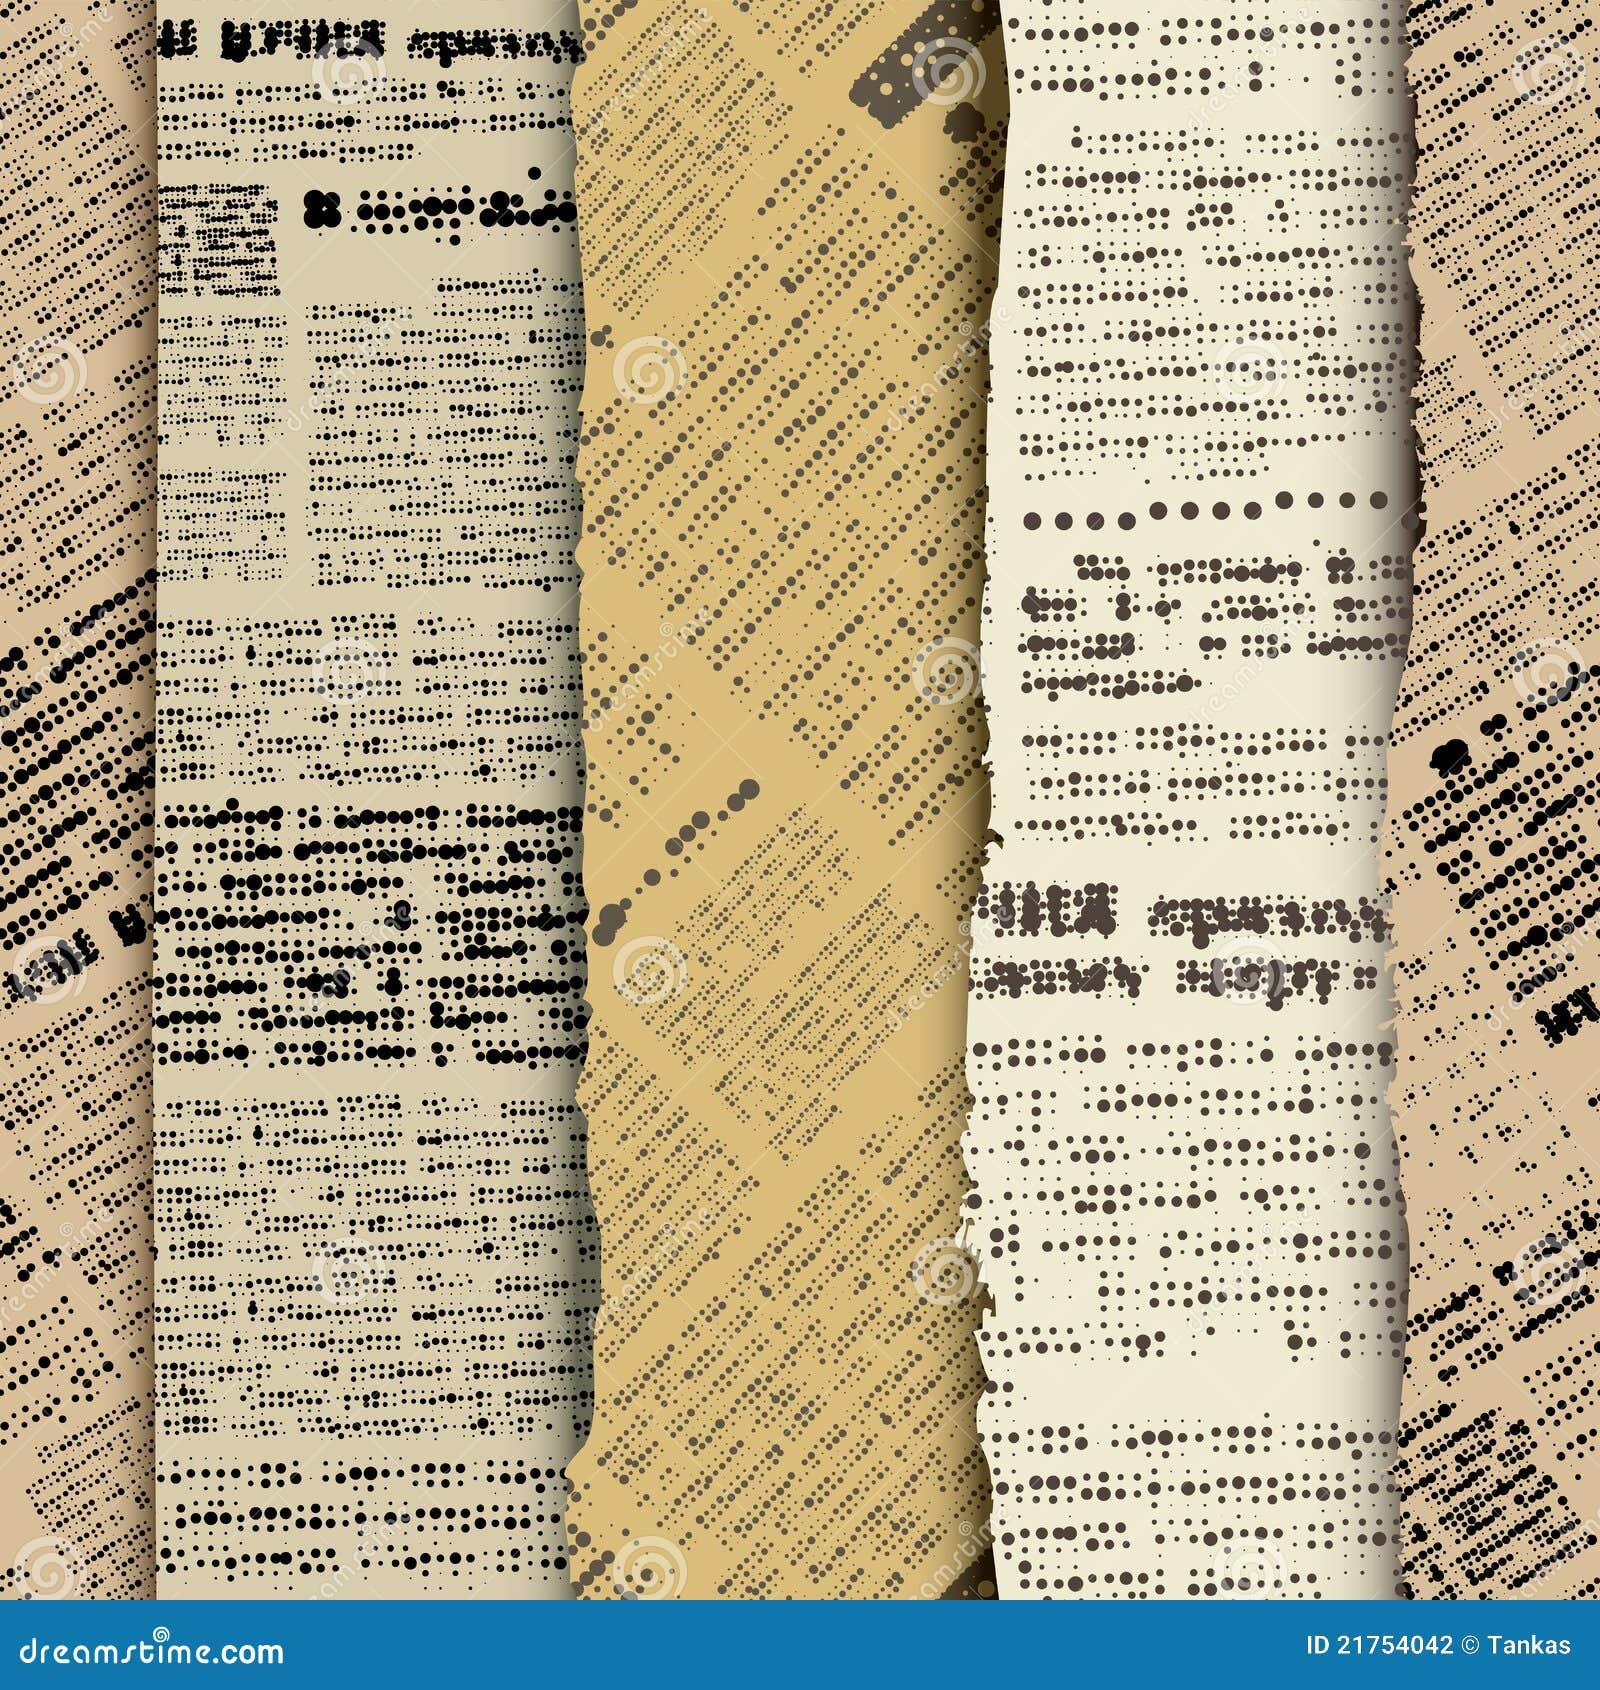 How to scrapbook newspaper clippings - Scrapbook Newspaper